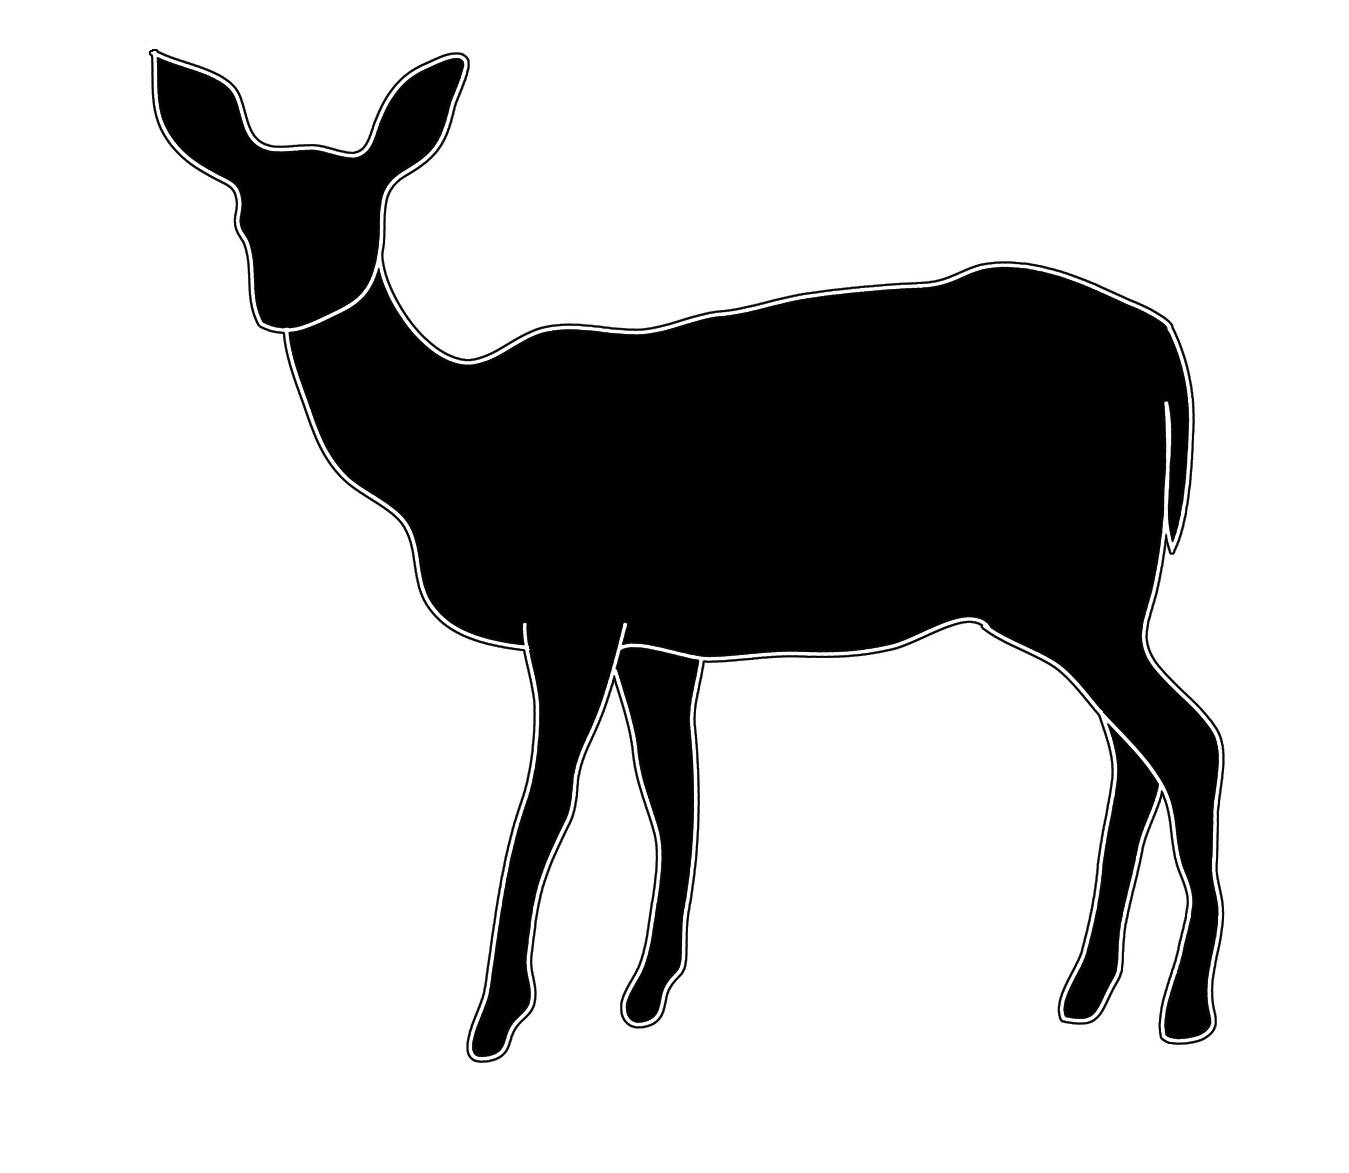 1349x1173 Silhouette Sketch Of Female Deer Art Silhouettes